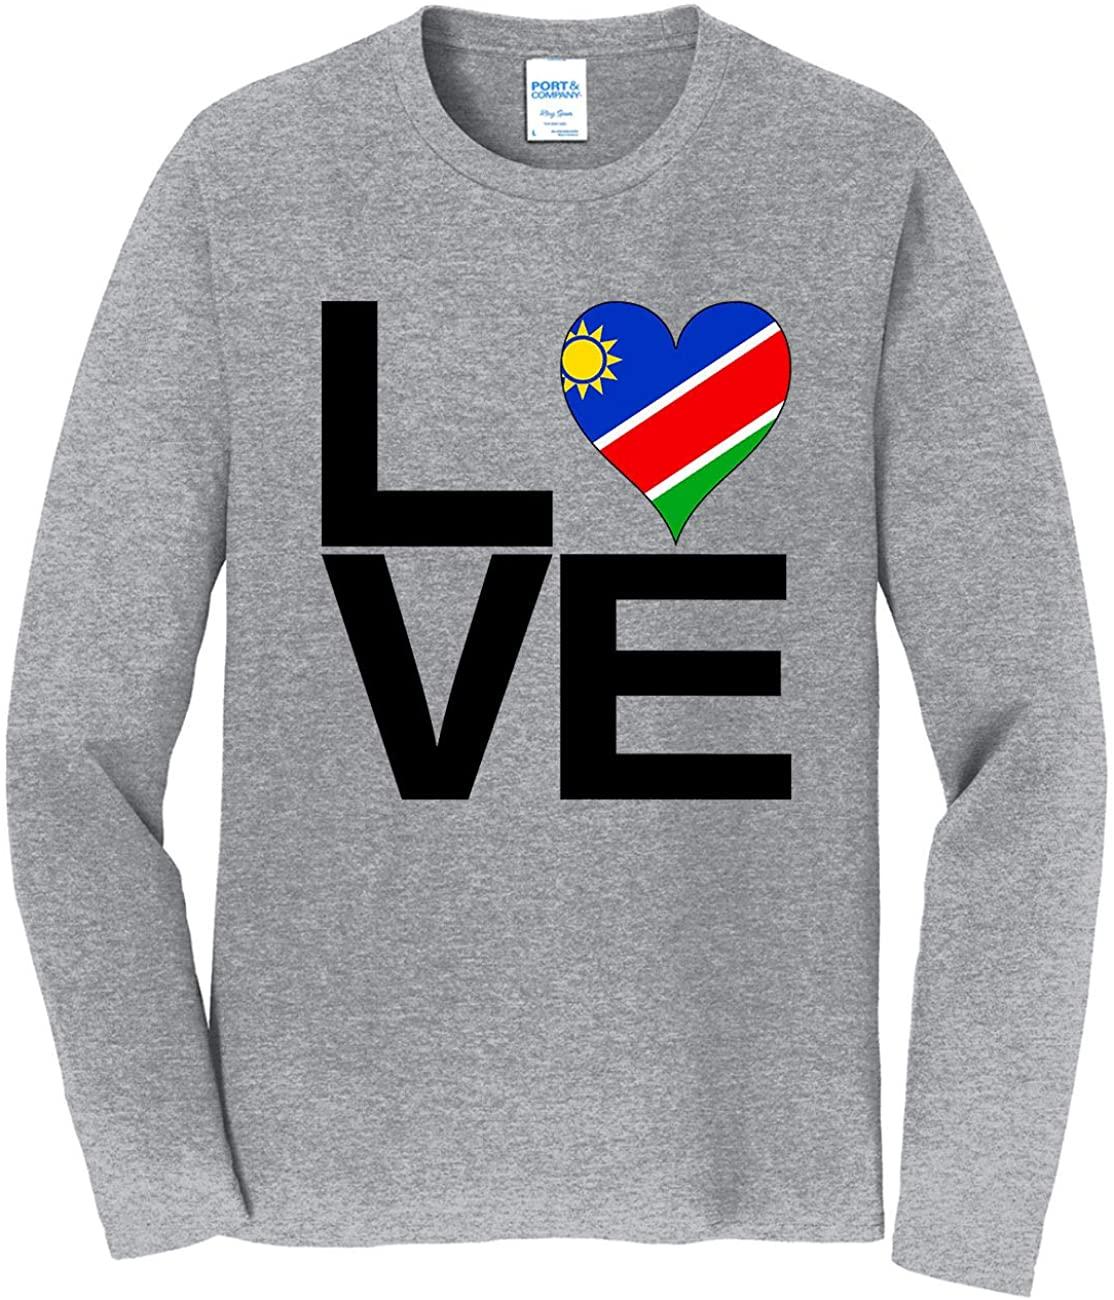 HARD EDGE DESIGN Men's Love Block Namibia Heart Long Sleeve T-Shirt, 4X-Large, Heather Gray